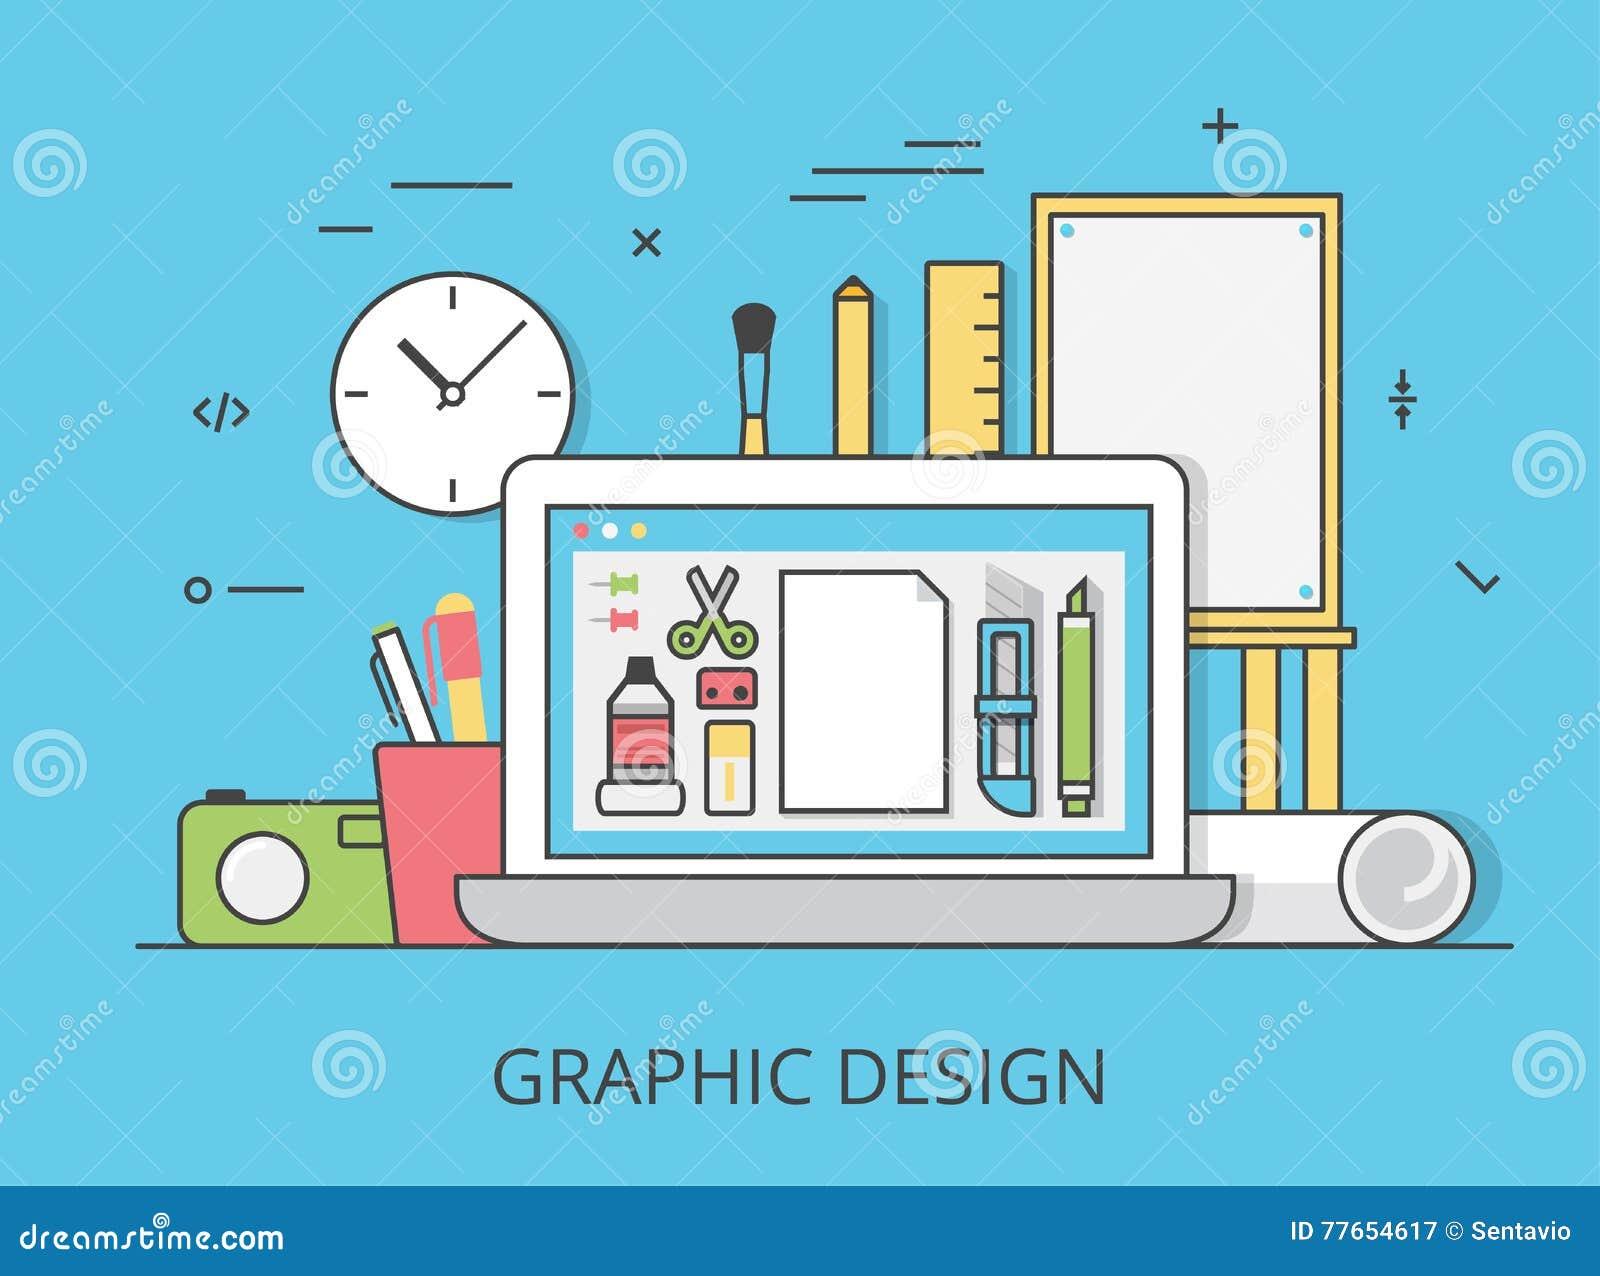 Download Linear Flat Graphic Design Website Art Tools Vector Stock